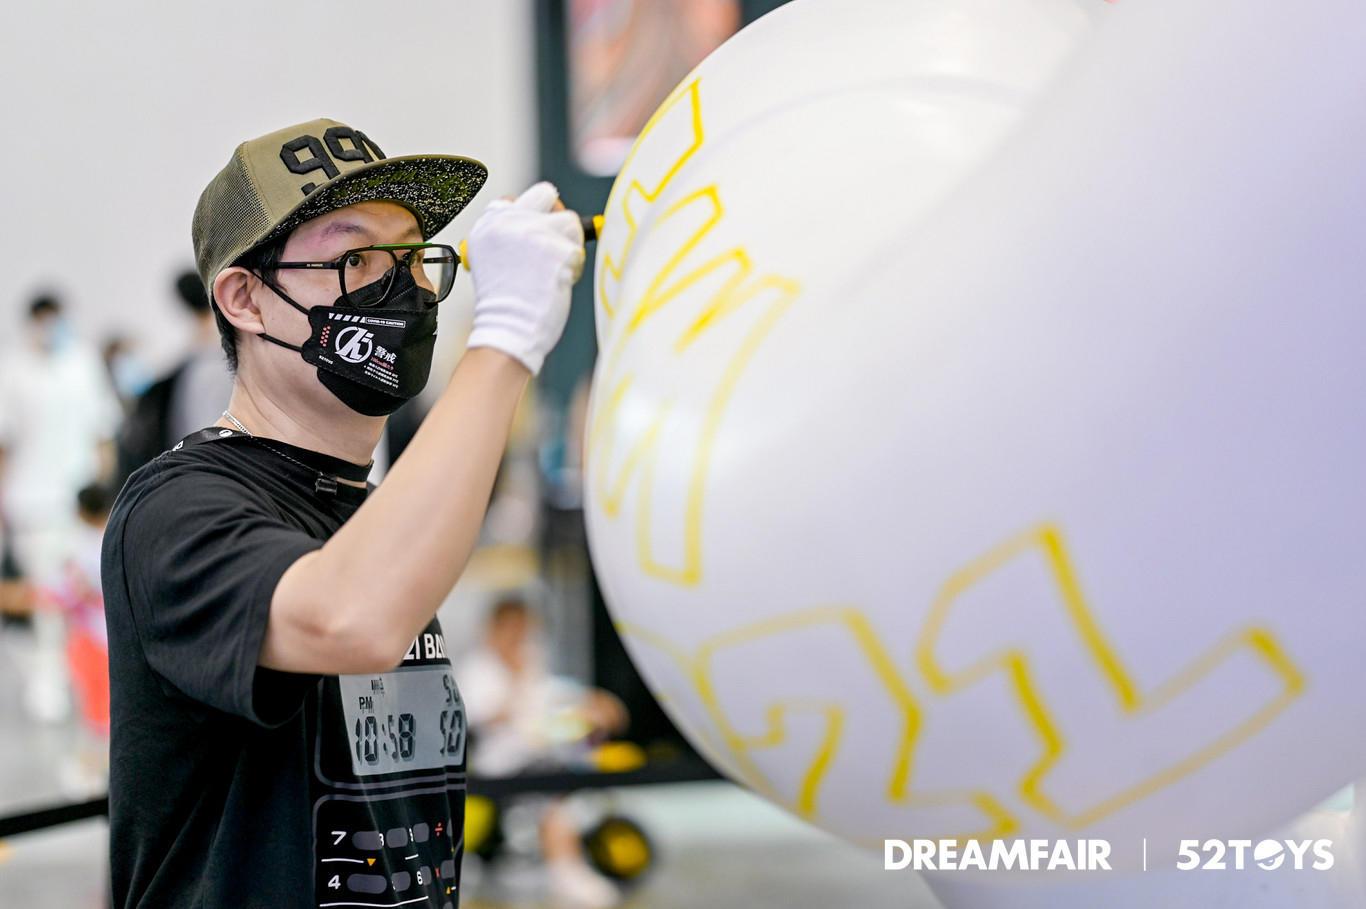 X2R在DREAMFAIR 2021展会现场涂鸦创作